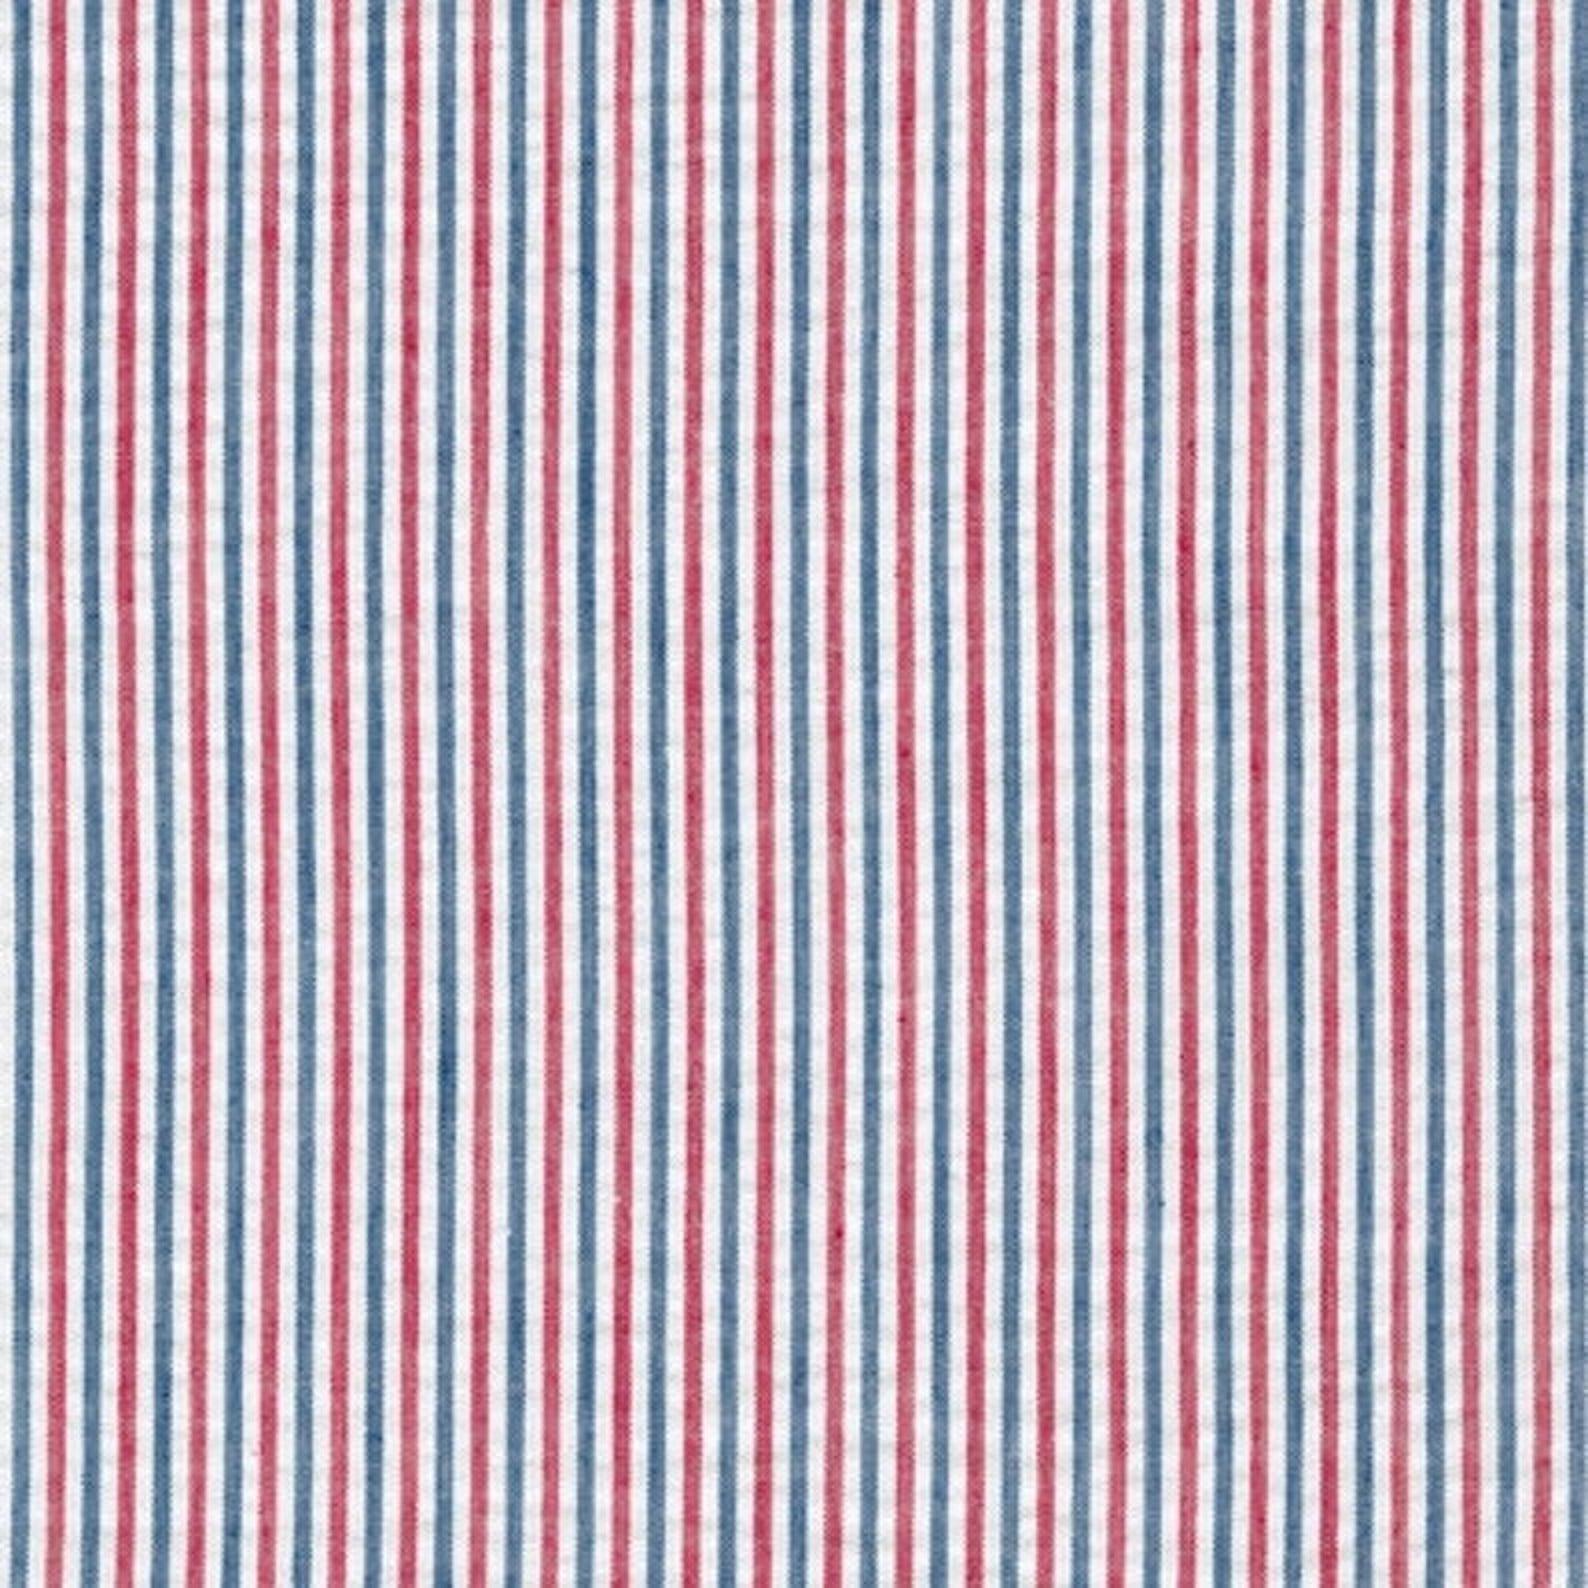 Remnant: Americana Stripe Seersucker Fabric by Robert Kaufman - 3/4 yard